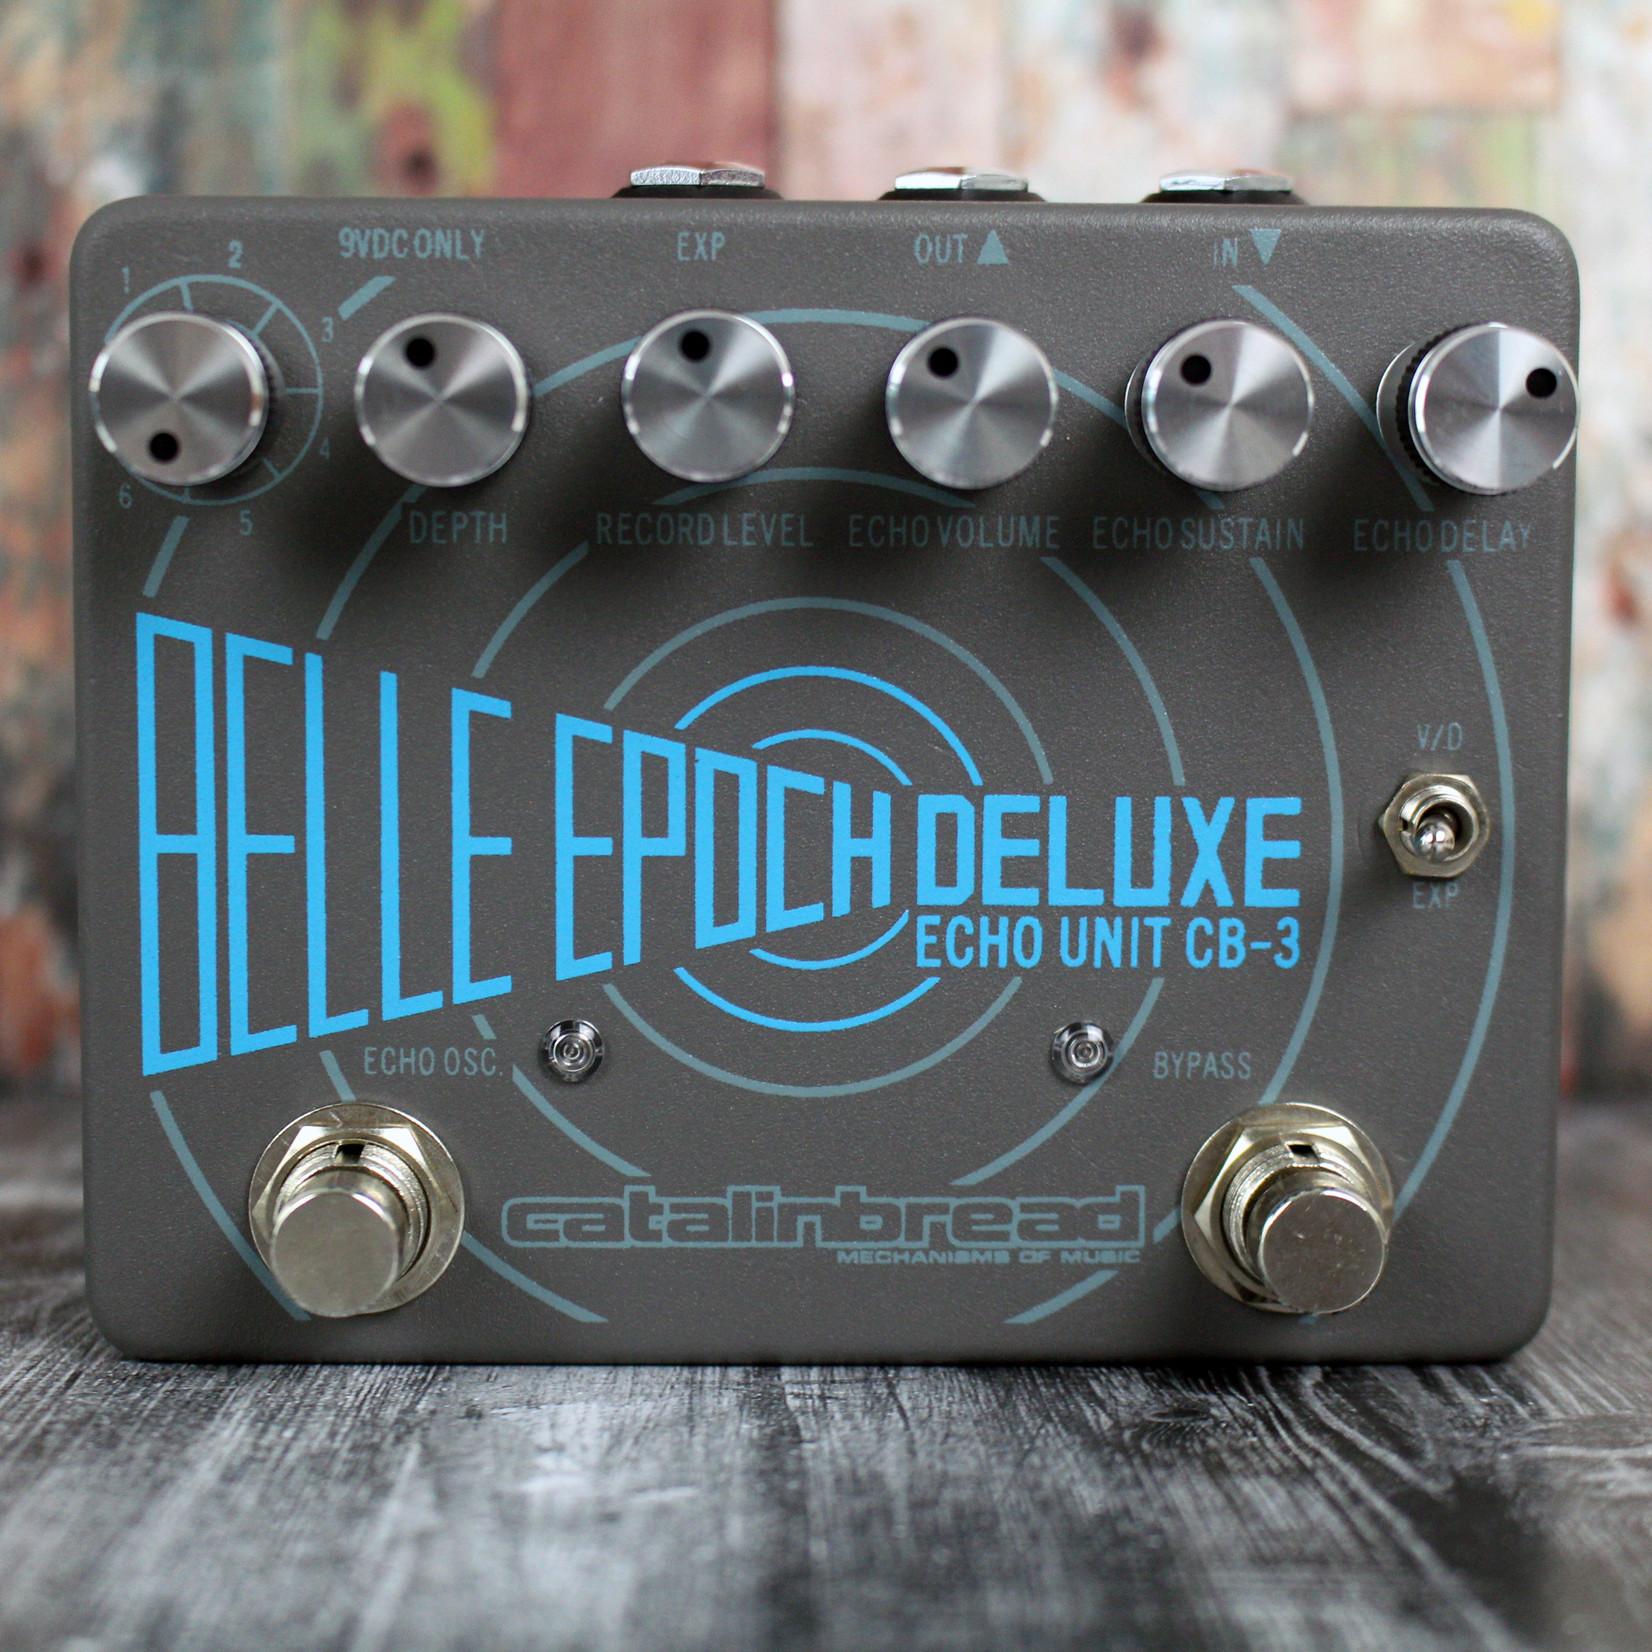 Catalinbread Catalinbread Belle Epoch Deluxe CB3 Dual Tape Echo Emulation